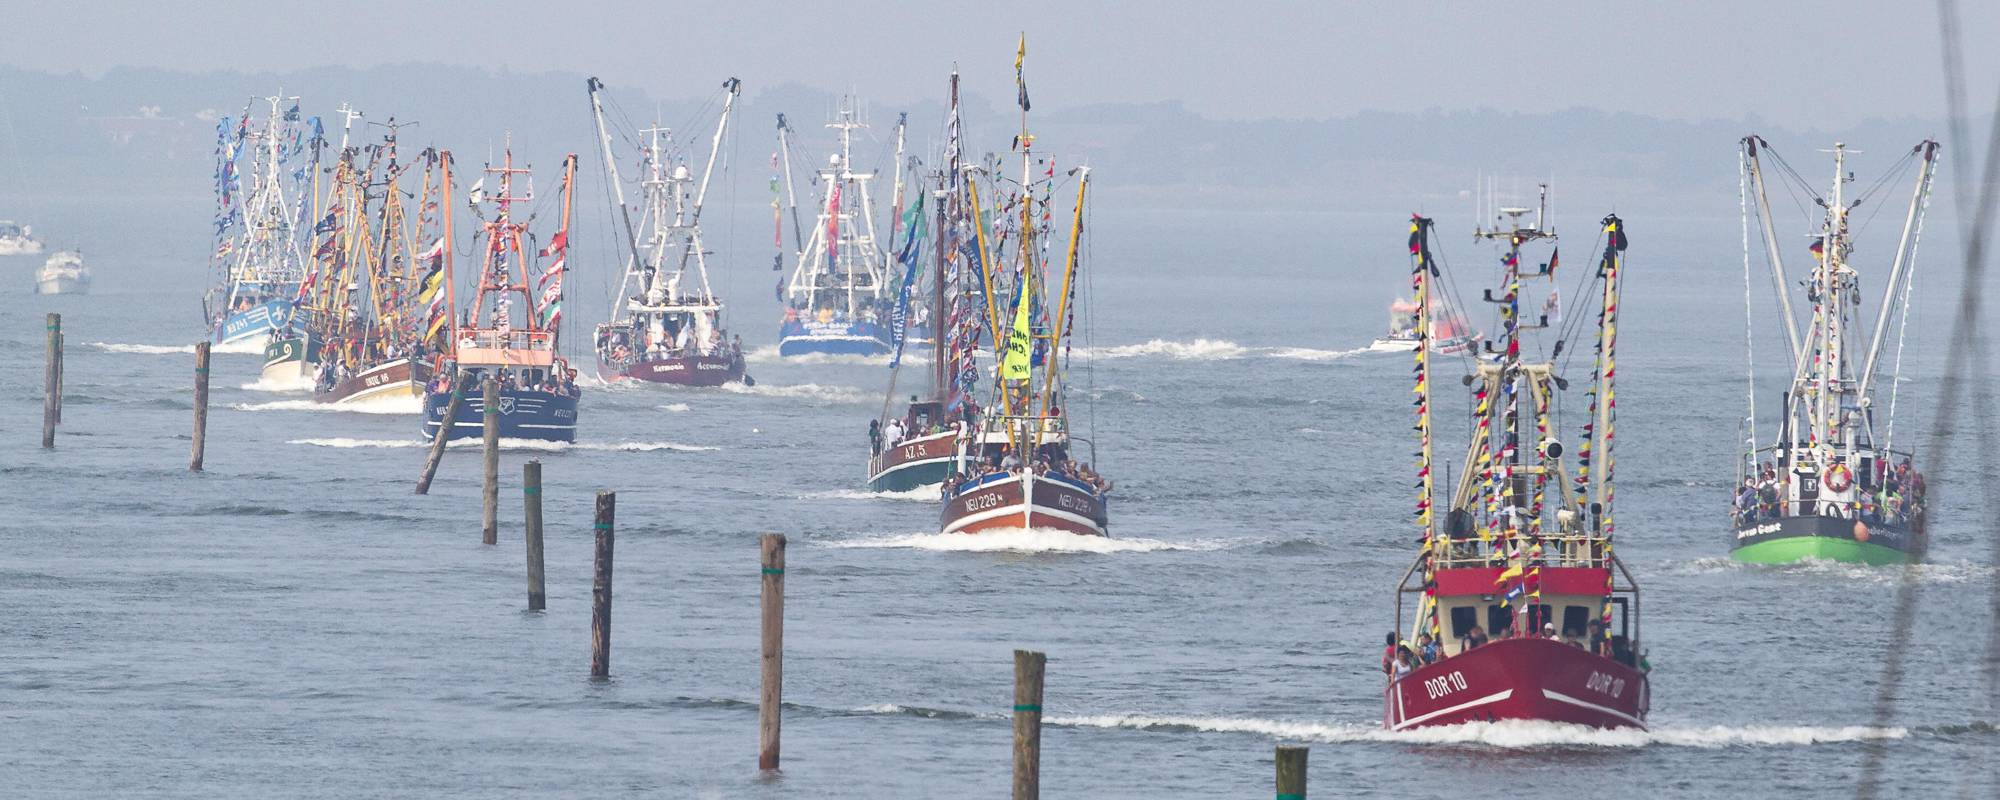 Kutterregatta - Regatta der Krabbenkutter